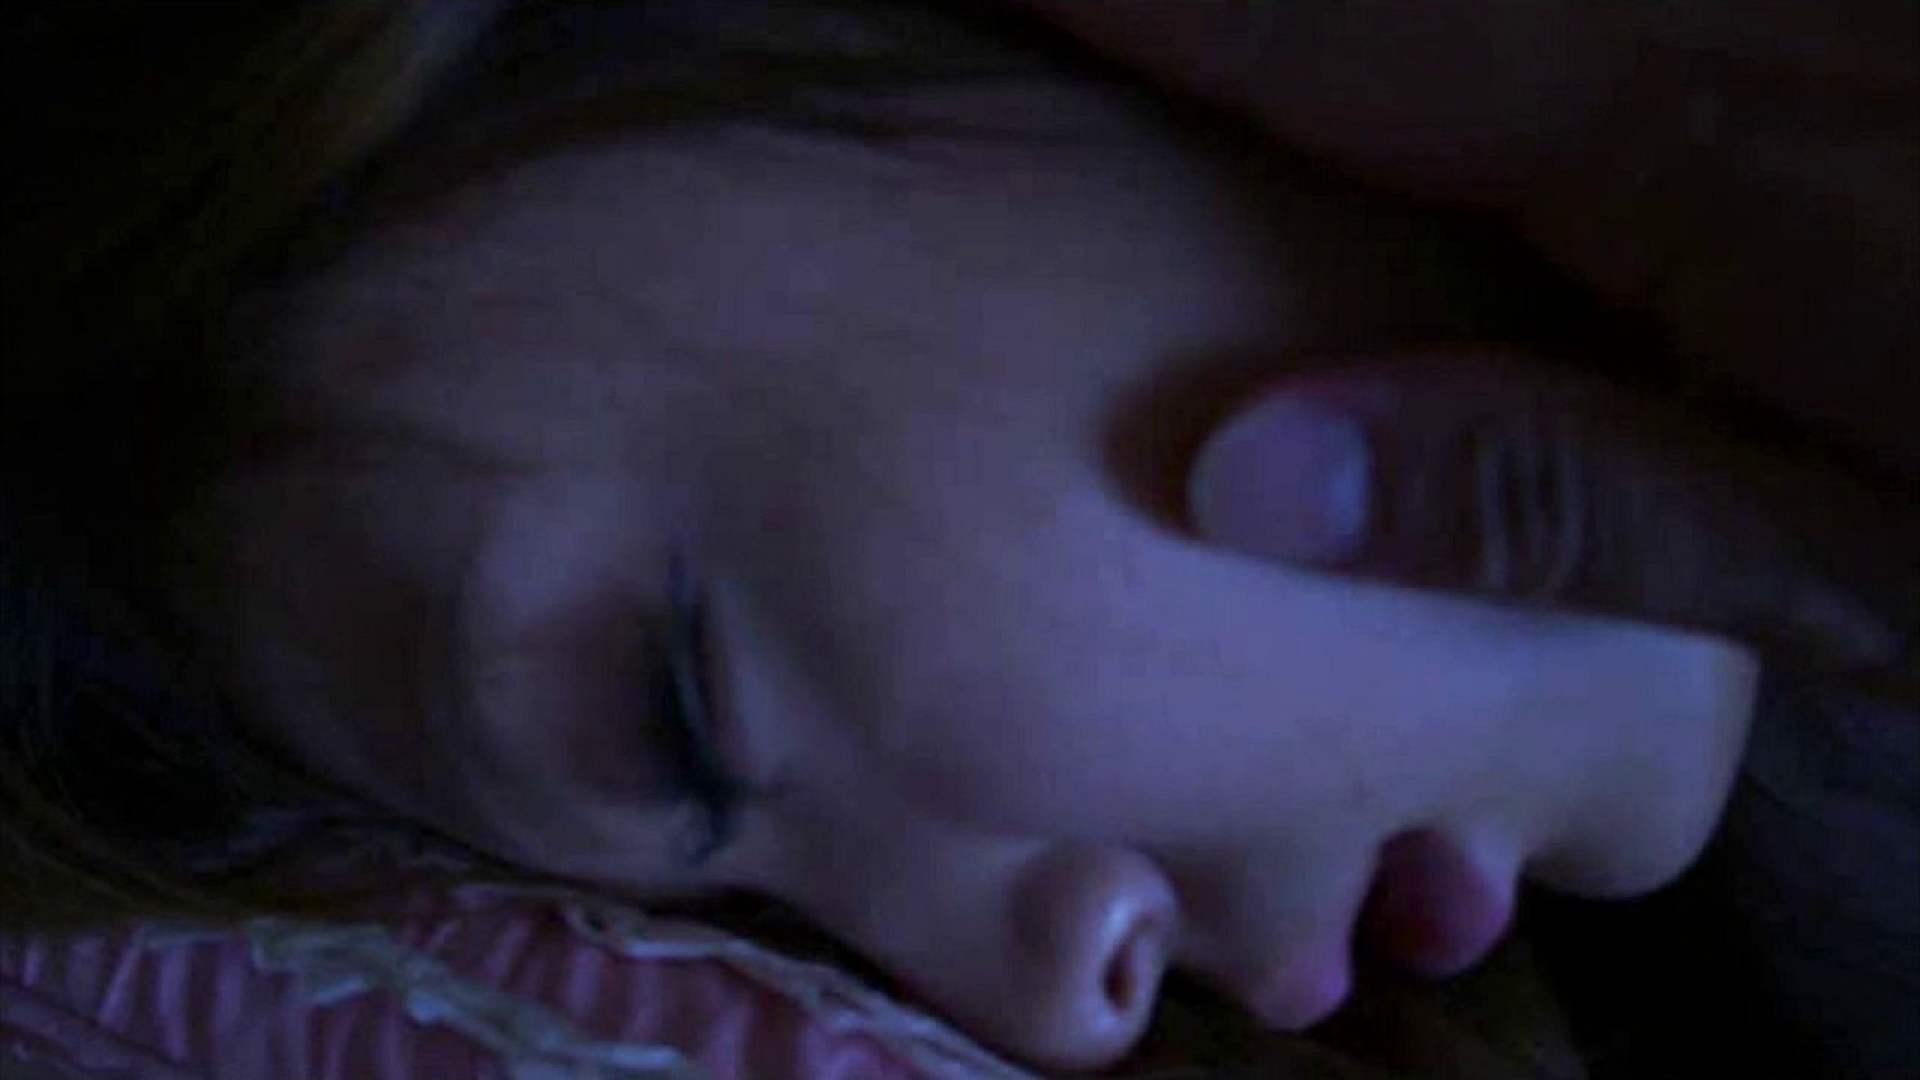 vol.5 ー前編ーユリナちゃんの身体を隅々まで観察しました。 ギャル攻め ぱこり動画紹介 89画像 62